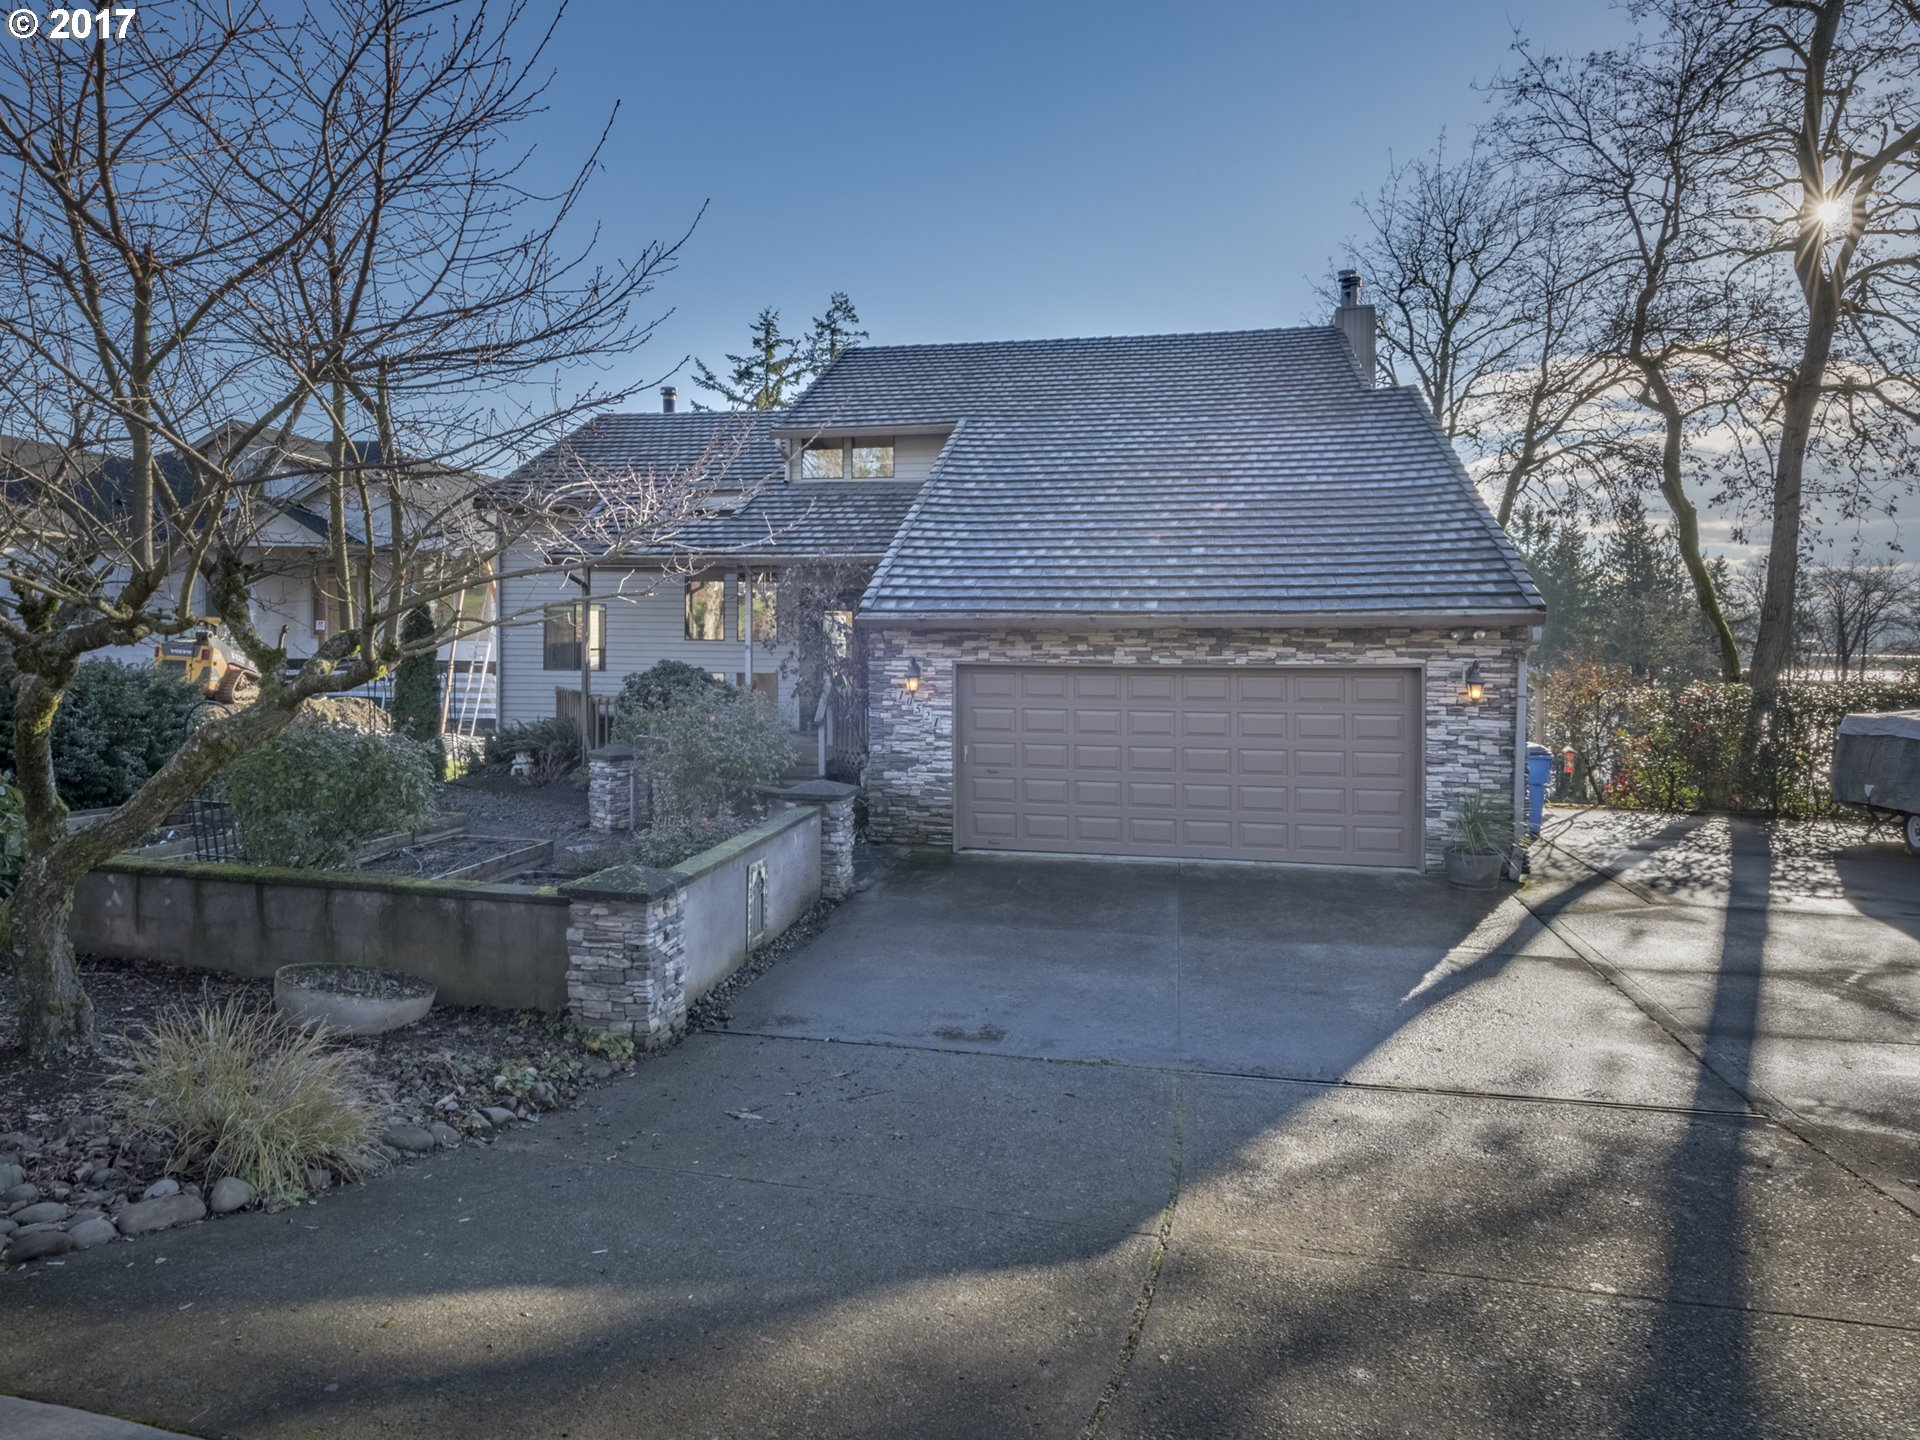 10521 SE EVERGREEN HWY, Vancouver, WA 98664